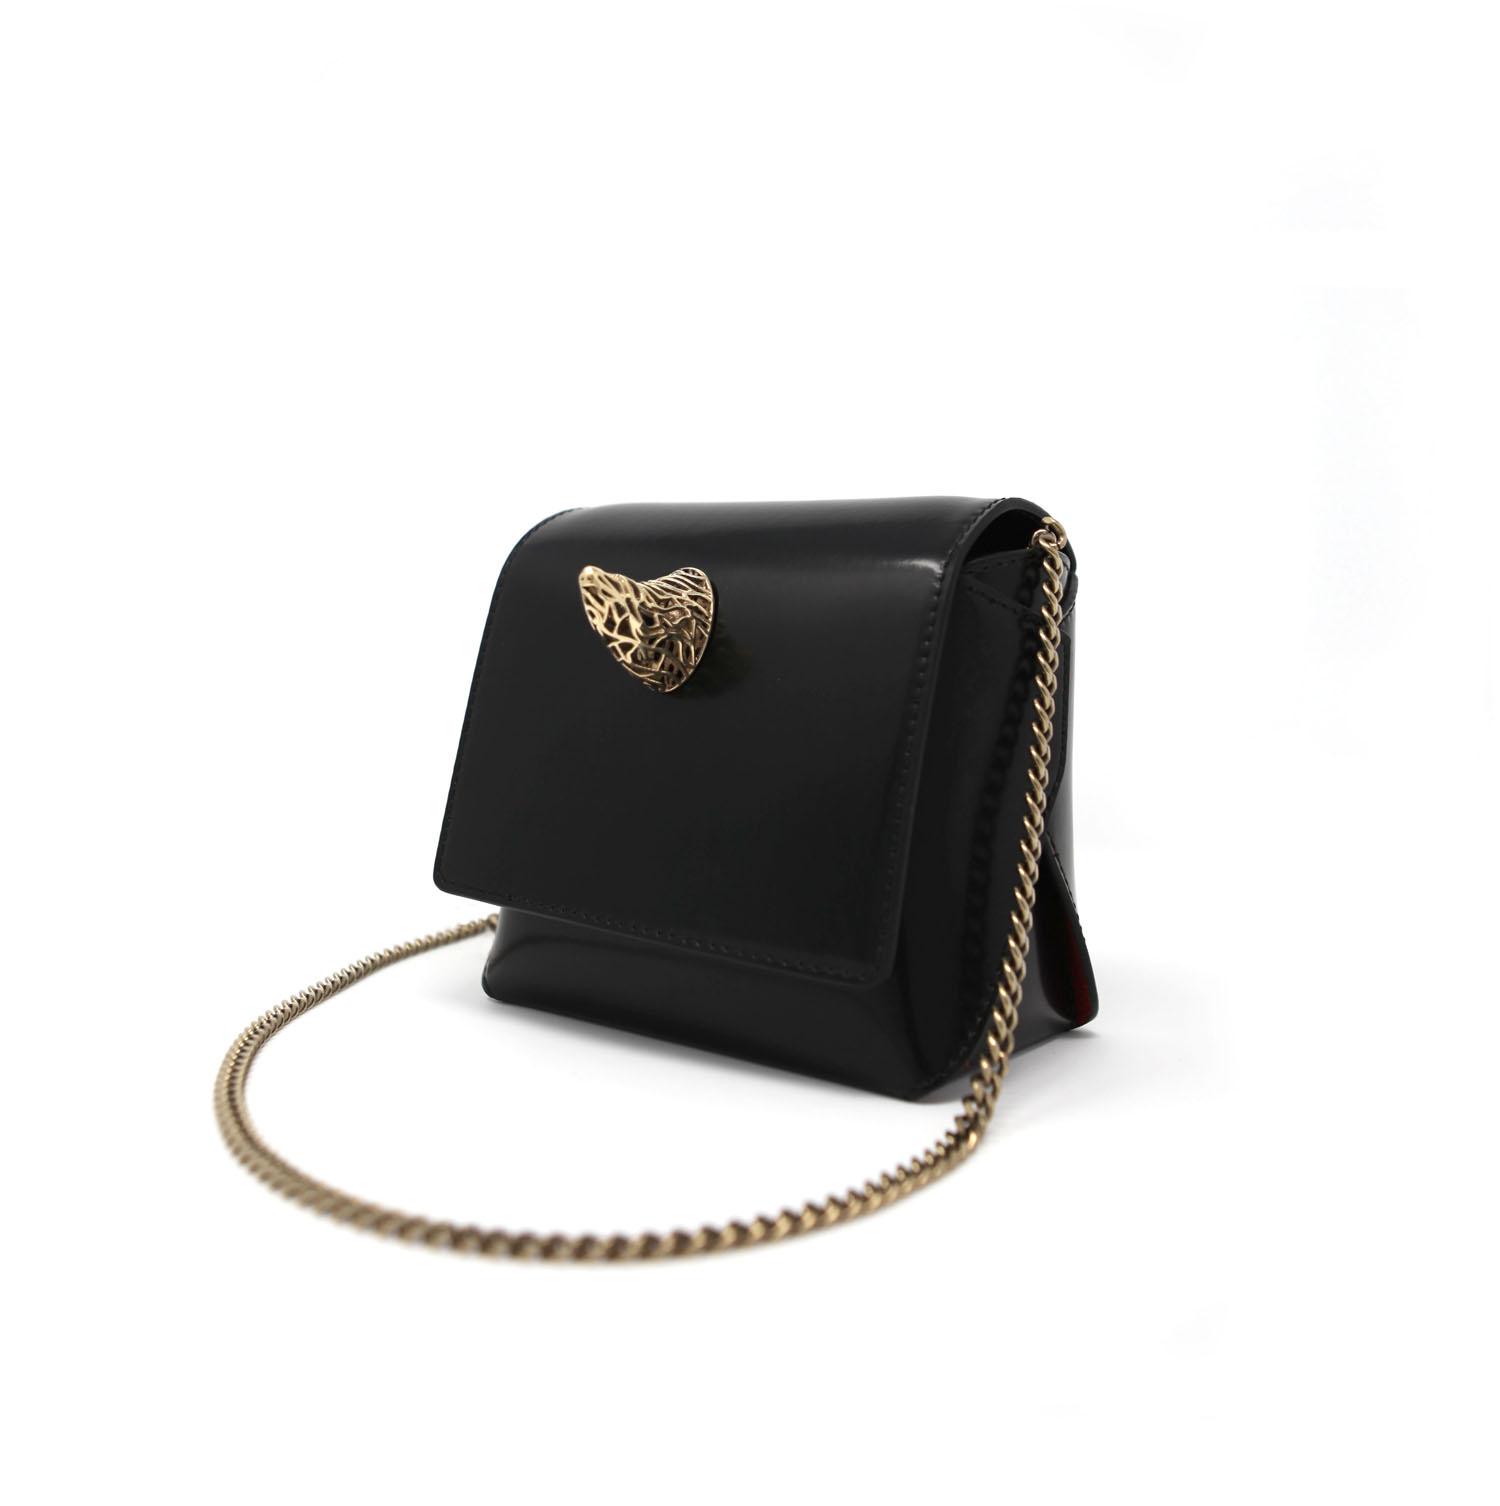 HandBags 22 - Maissa by Giulia Ber Tacchini Italian Custom Jewels and Luxury